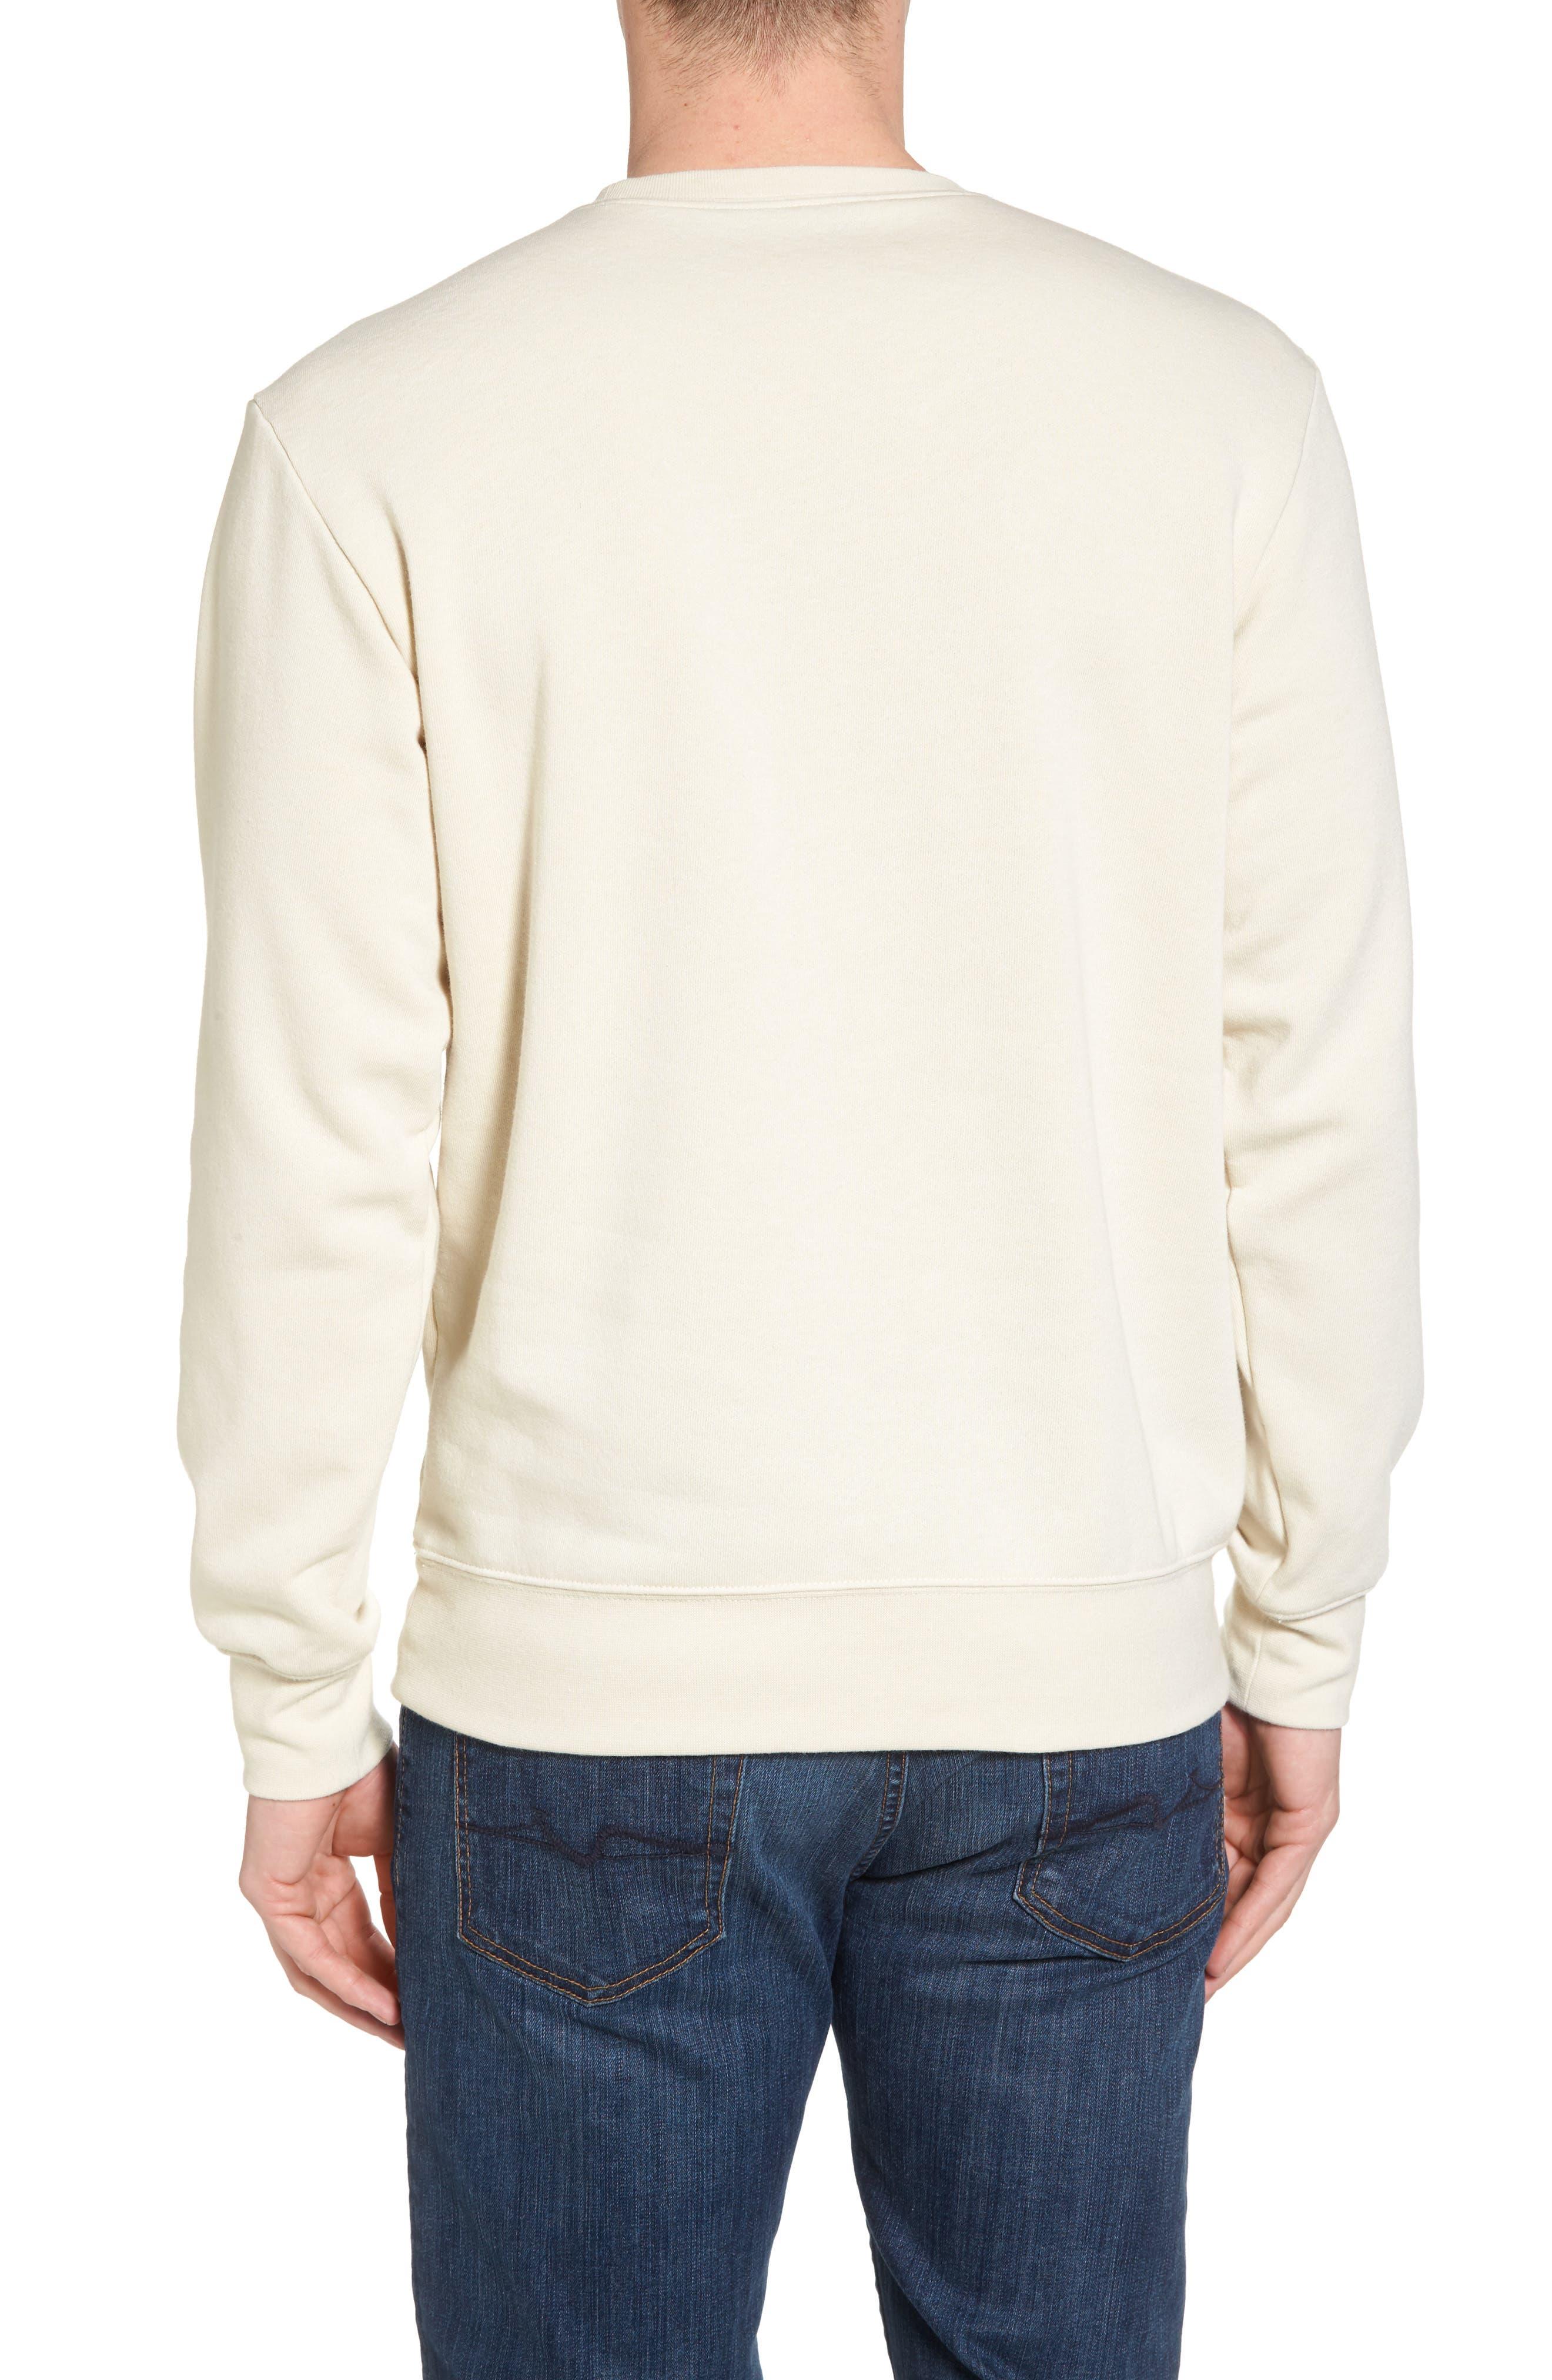 66 Classic Crew Sweatshirt,                             Alternate thumbnail 2, color,                             Vintage White Heather